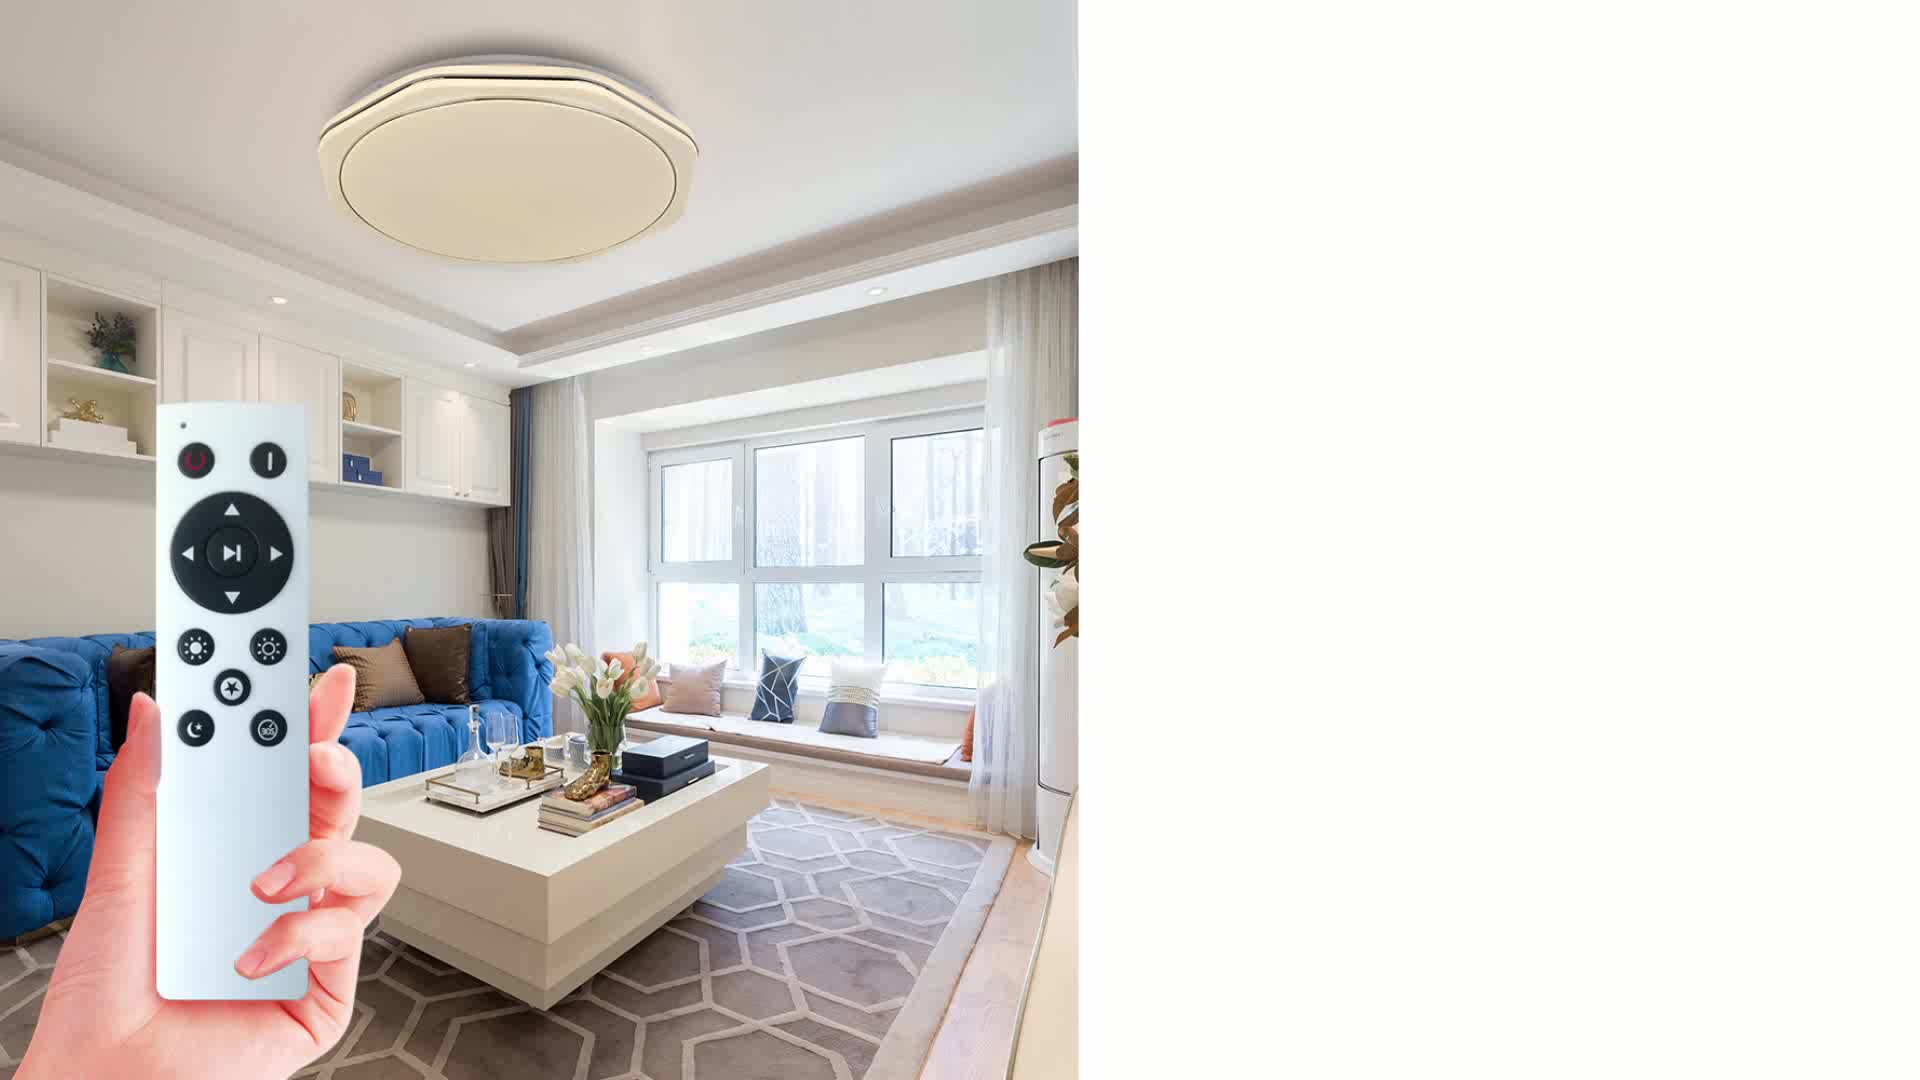 ENVIS 36W Smart Control Serie Infrarood Control Plafondlamp CE RoHS Acryl Moderne Eenvoudige Plafondlamp met Sliver Velg